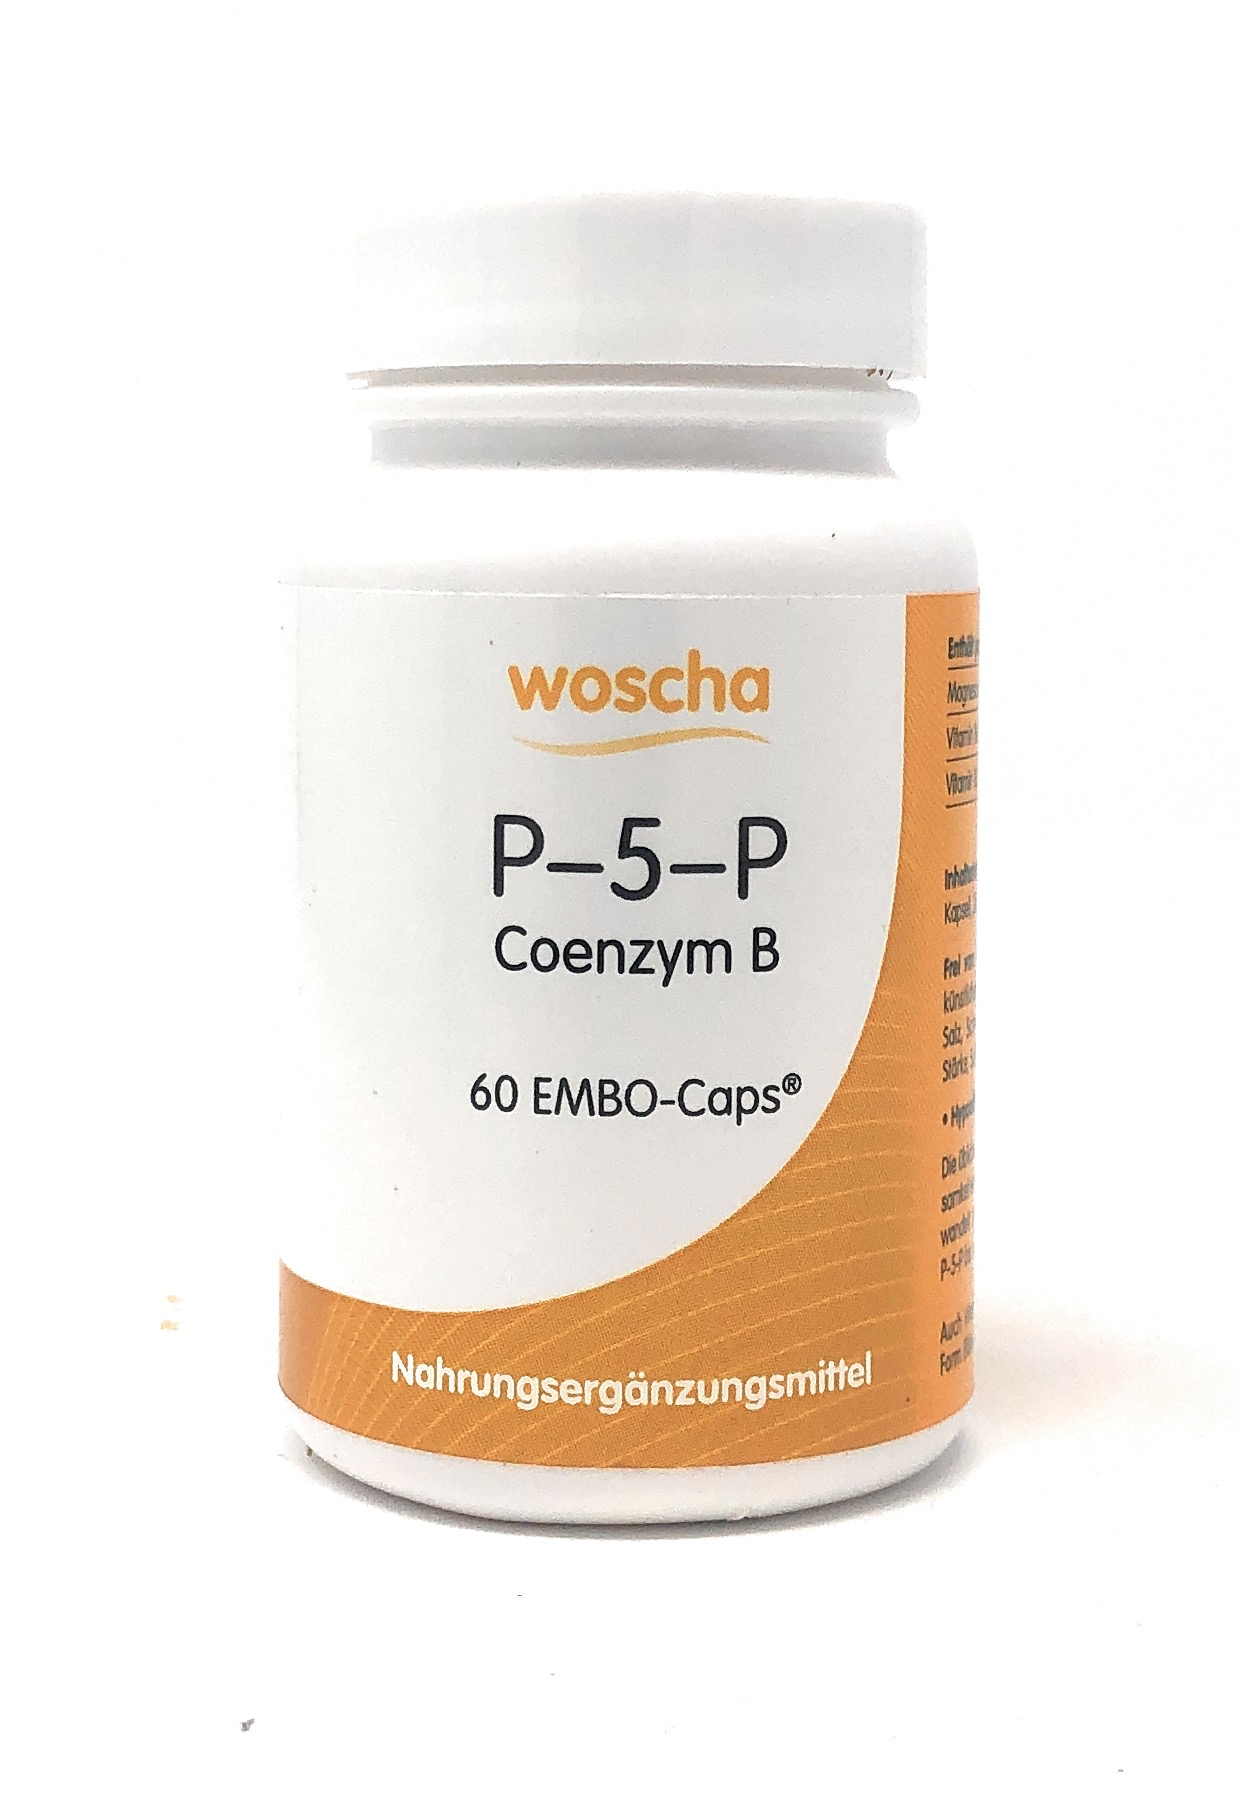 woscha P-5-P (50mg Co-Enzym B 6) 60 Embo-CAPS® (32g) (vegan)